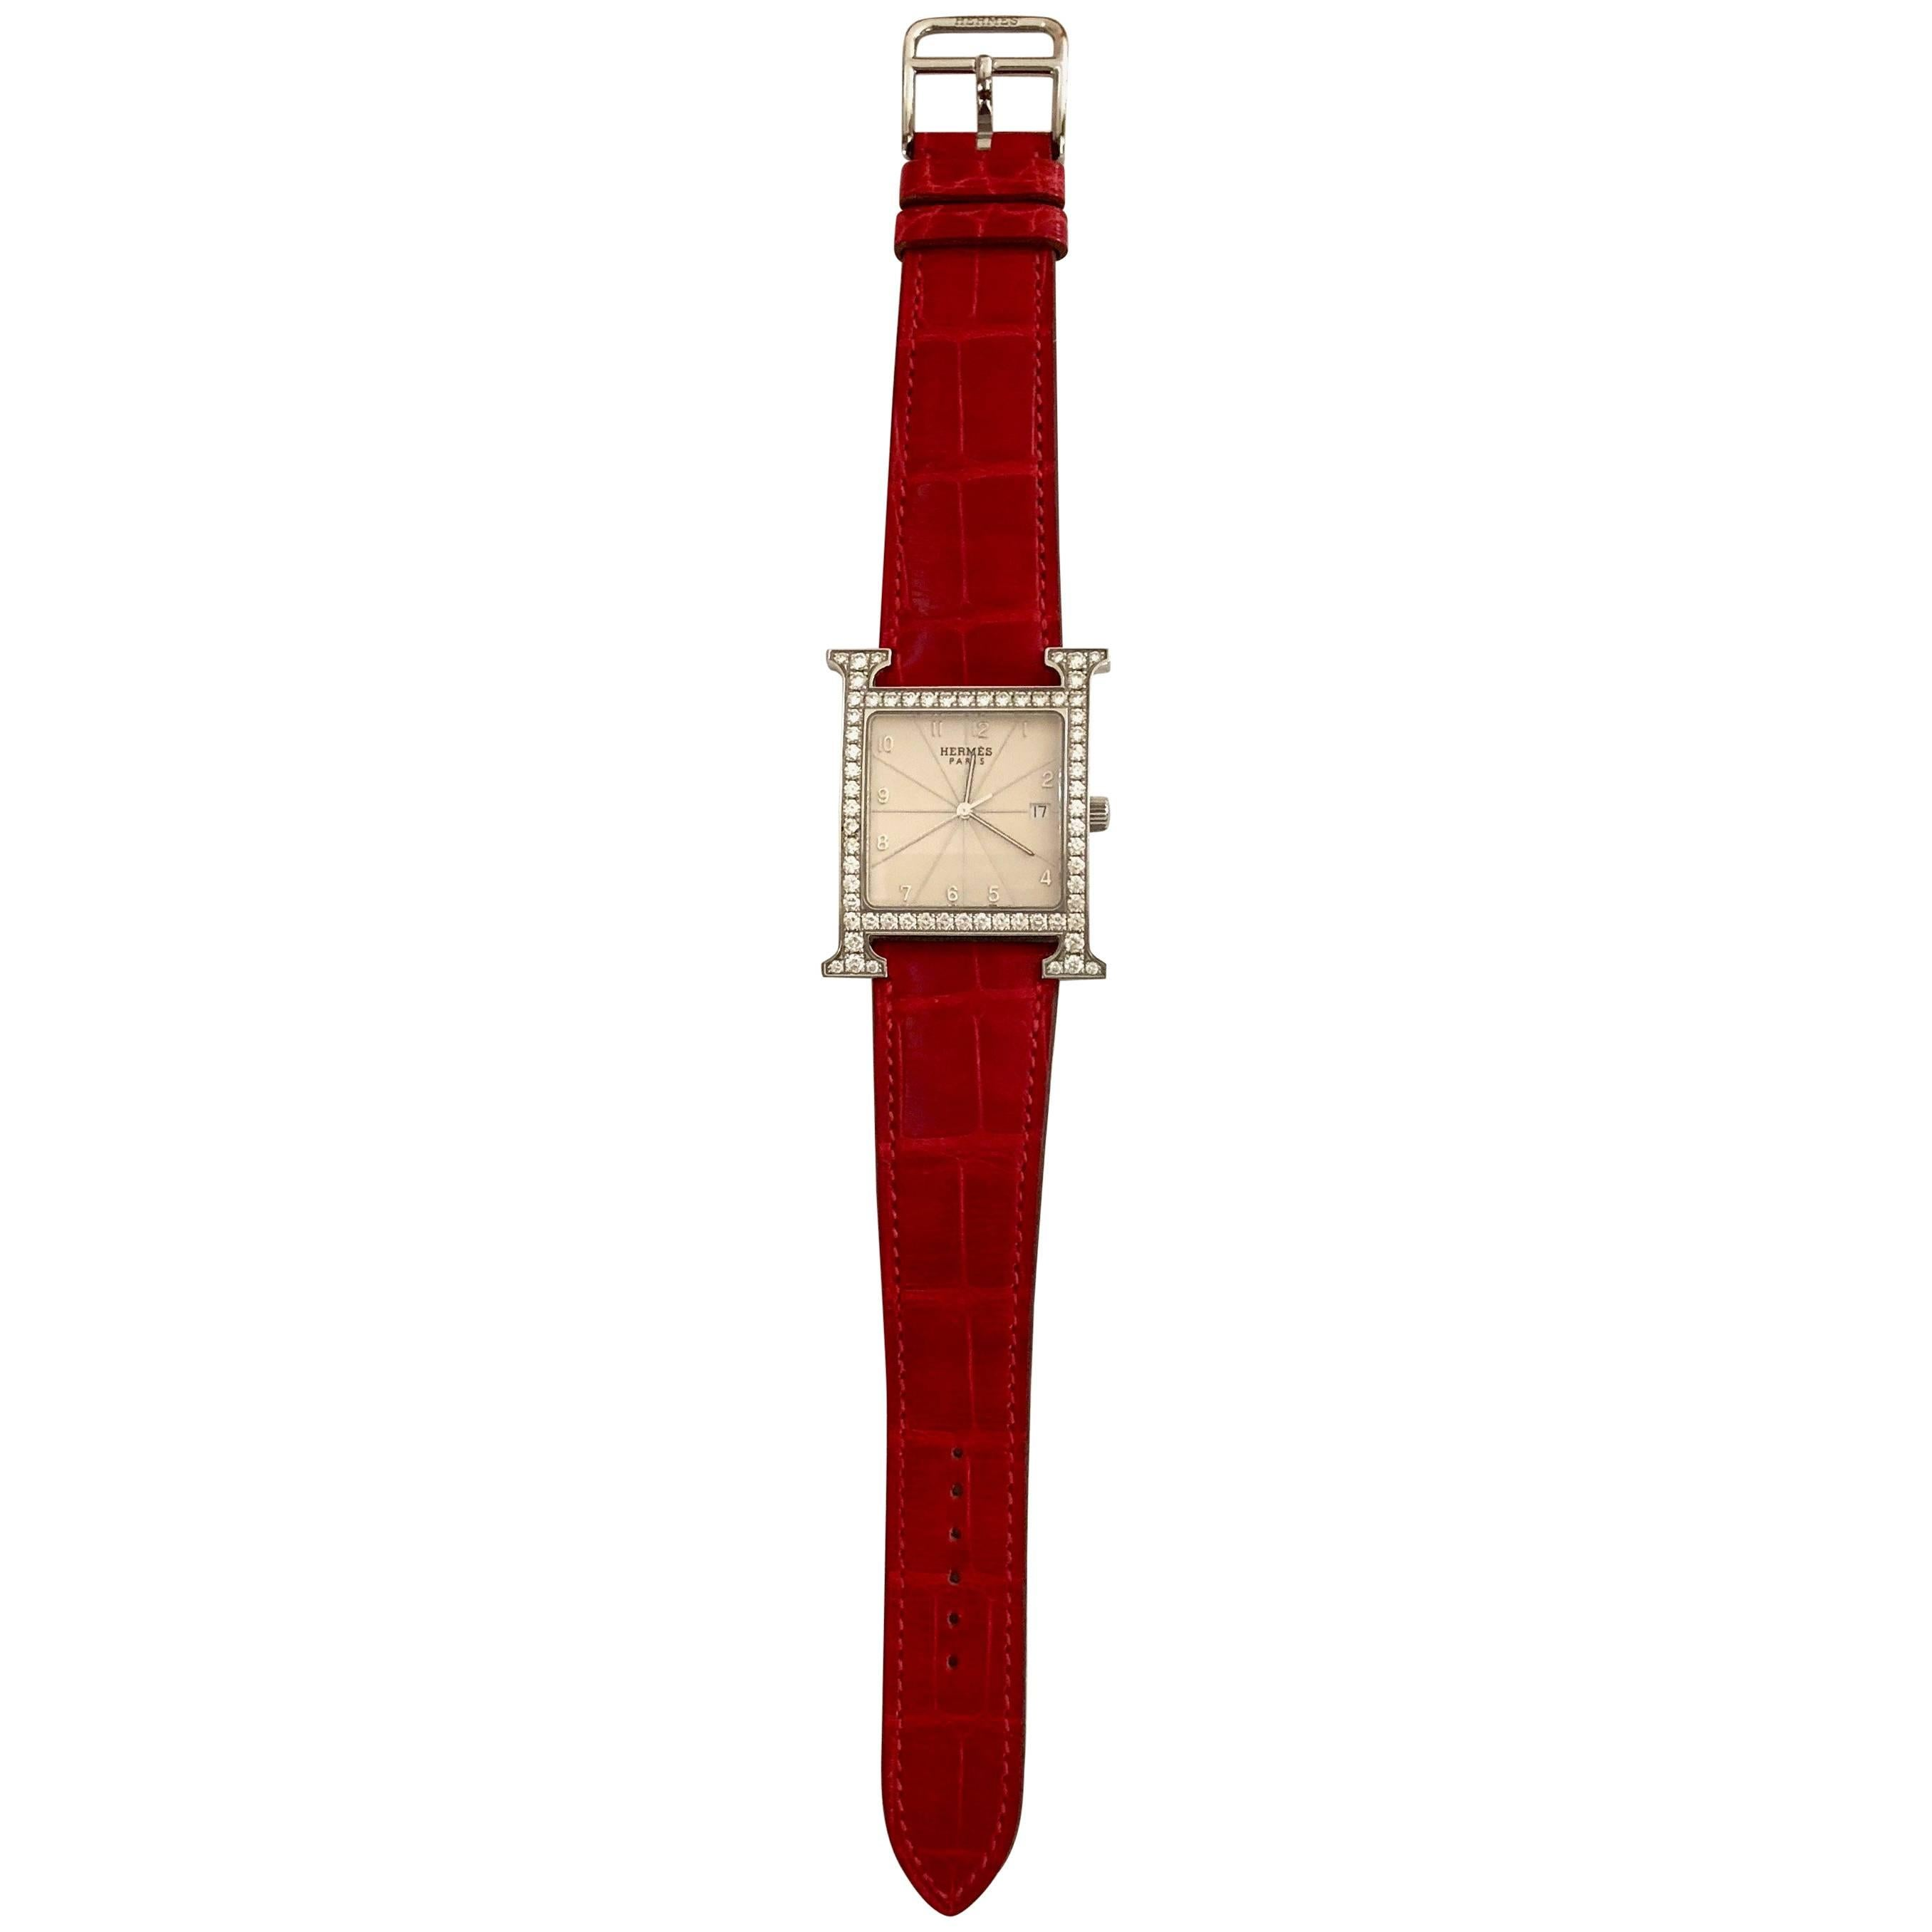 Hermes Stainless Steel Diamond Heure H Watch